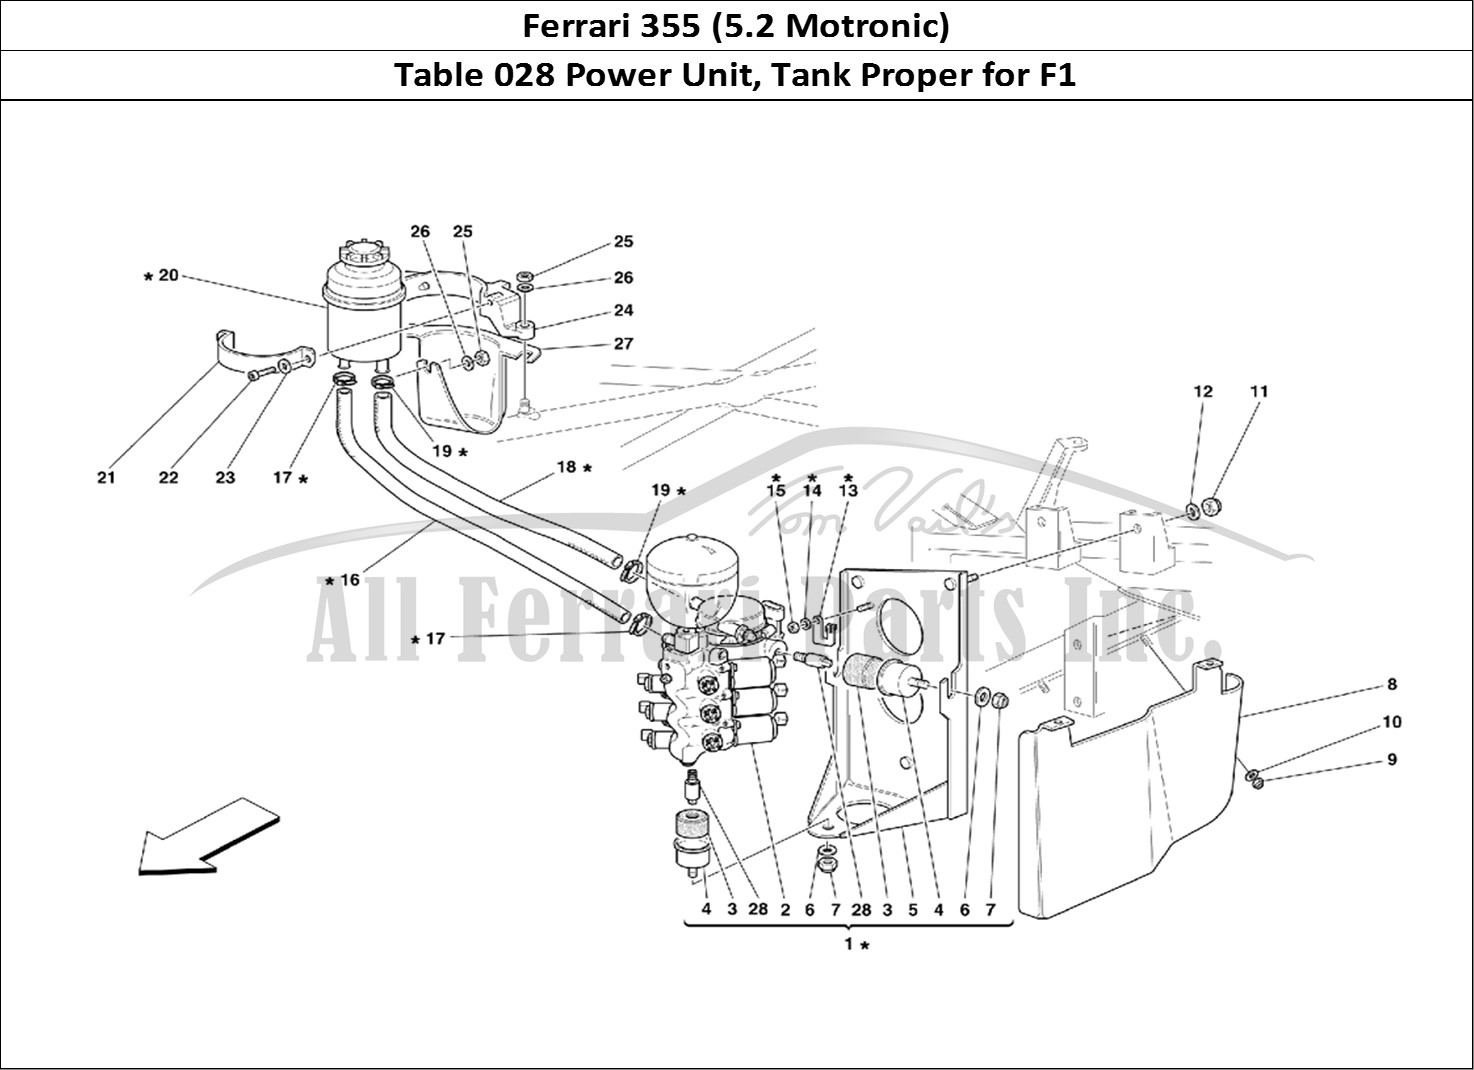 Buy original Ferrari 355 (5.2 Motronic) 028 Power Unit